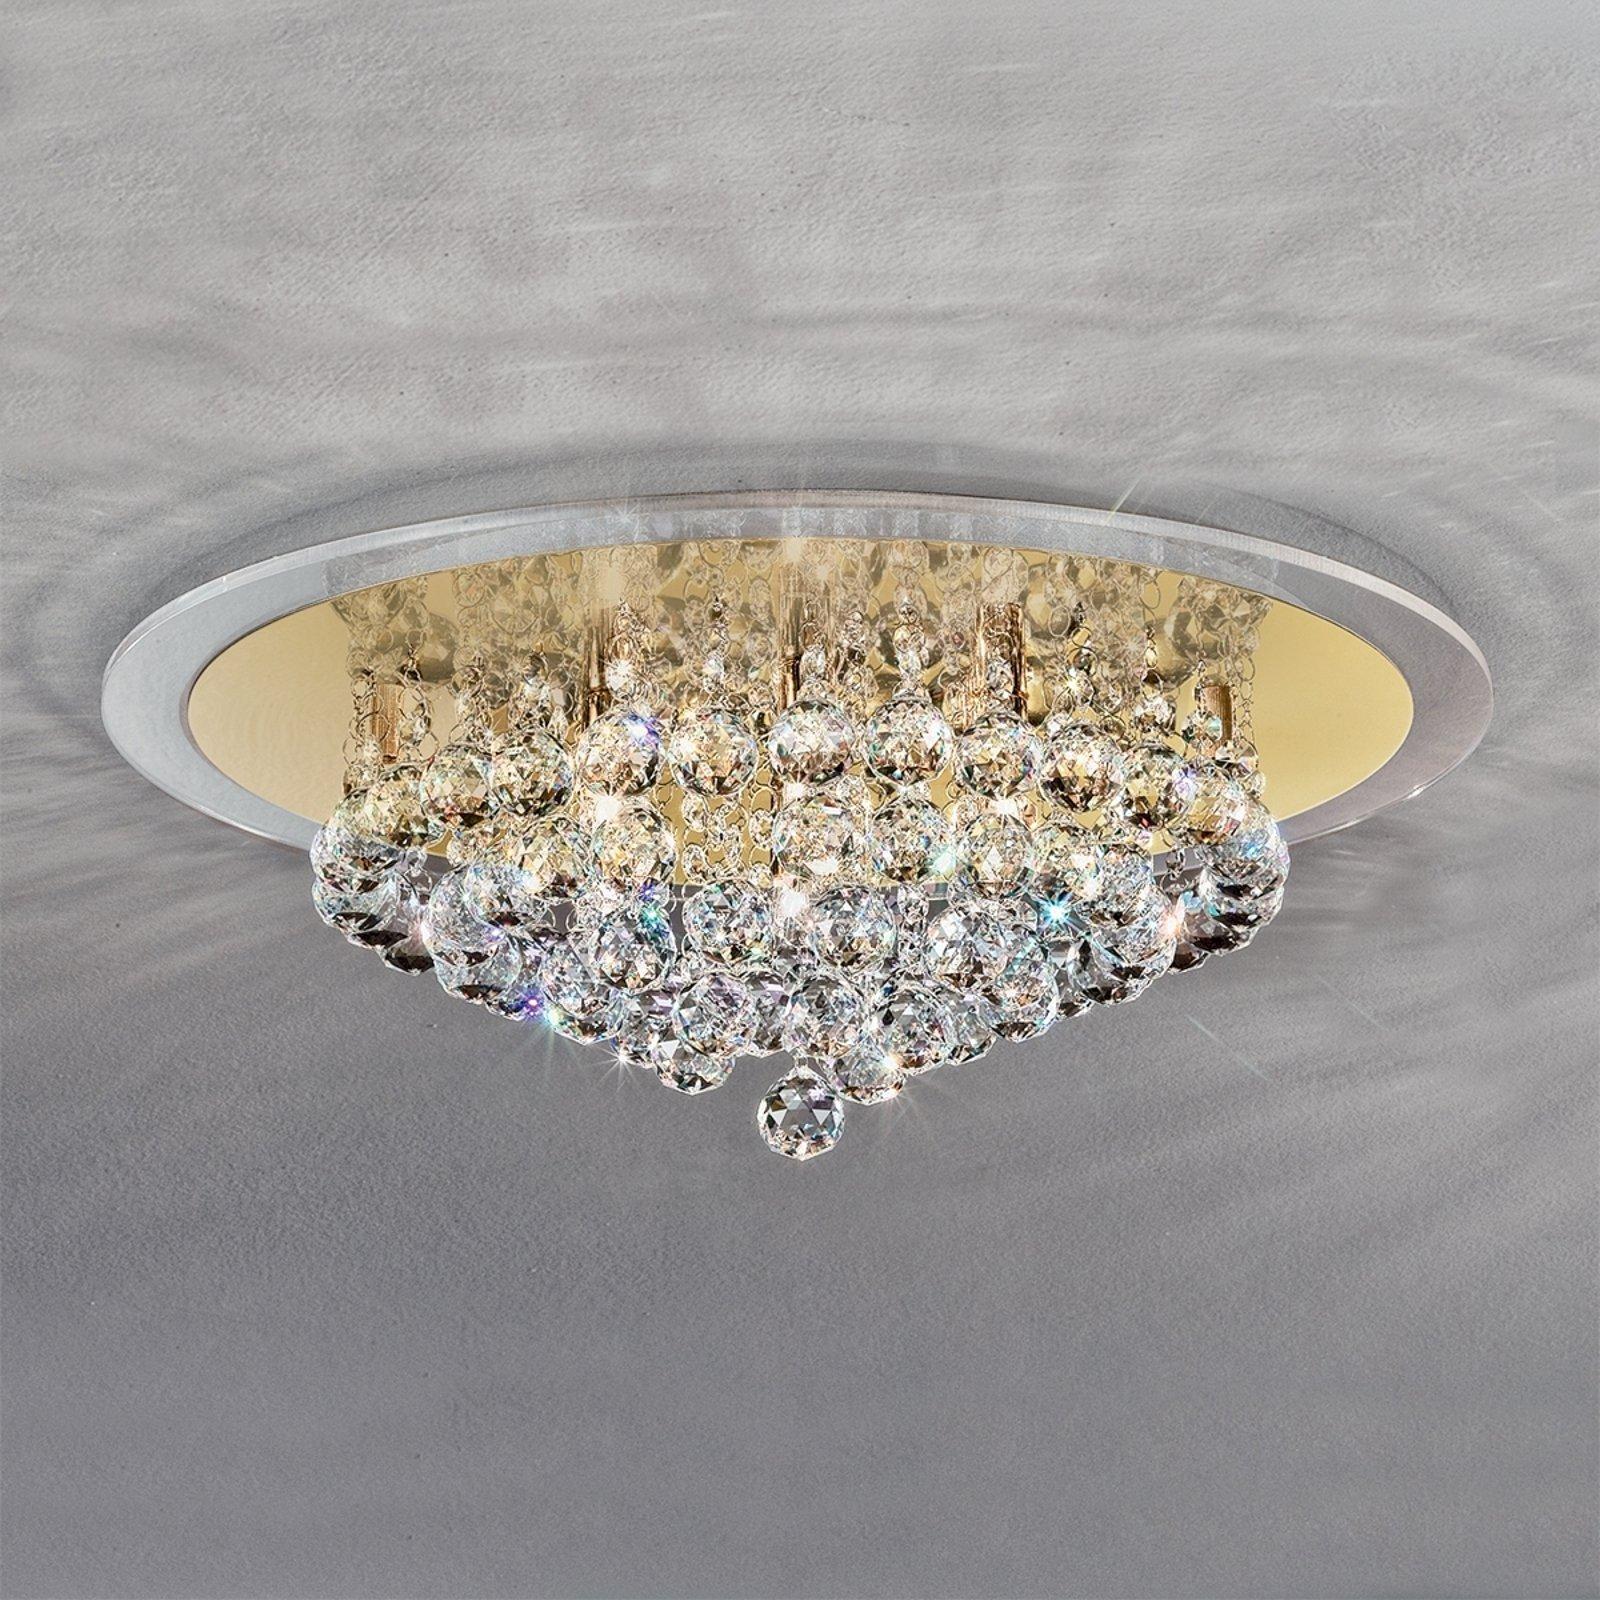 Uttrykksfull TUILA krystall taklampe 50 cm